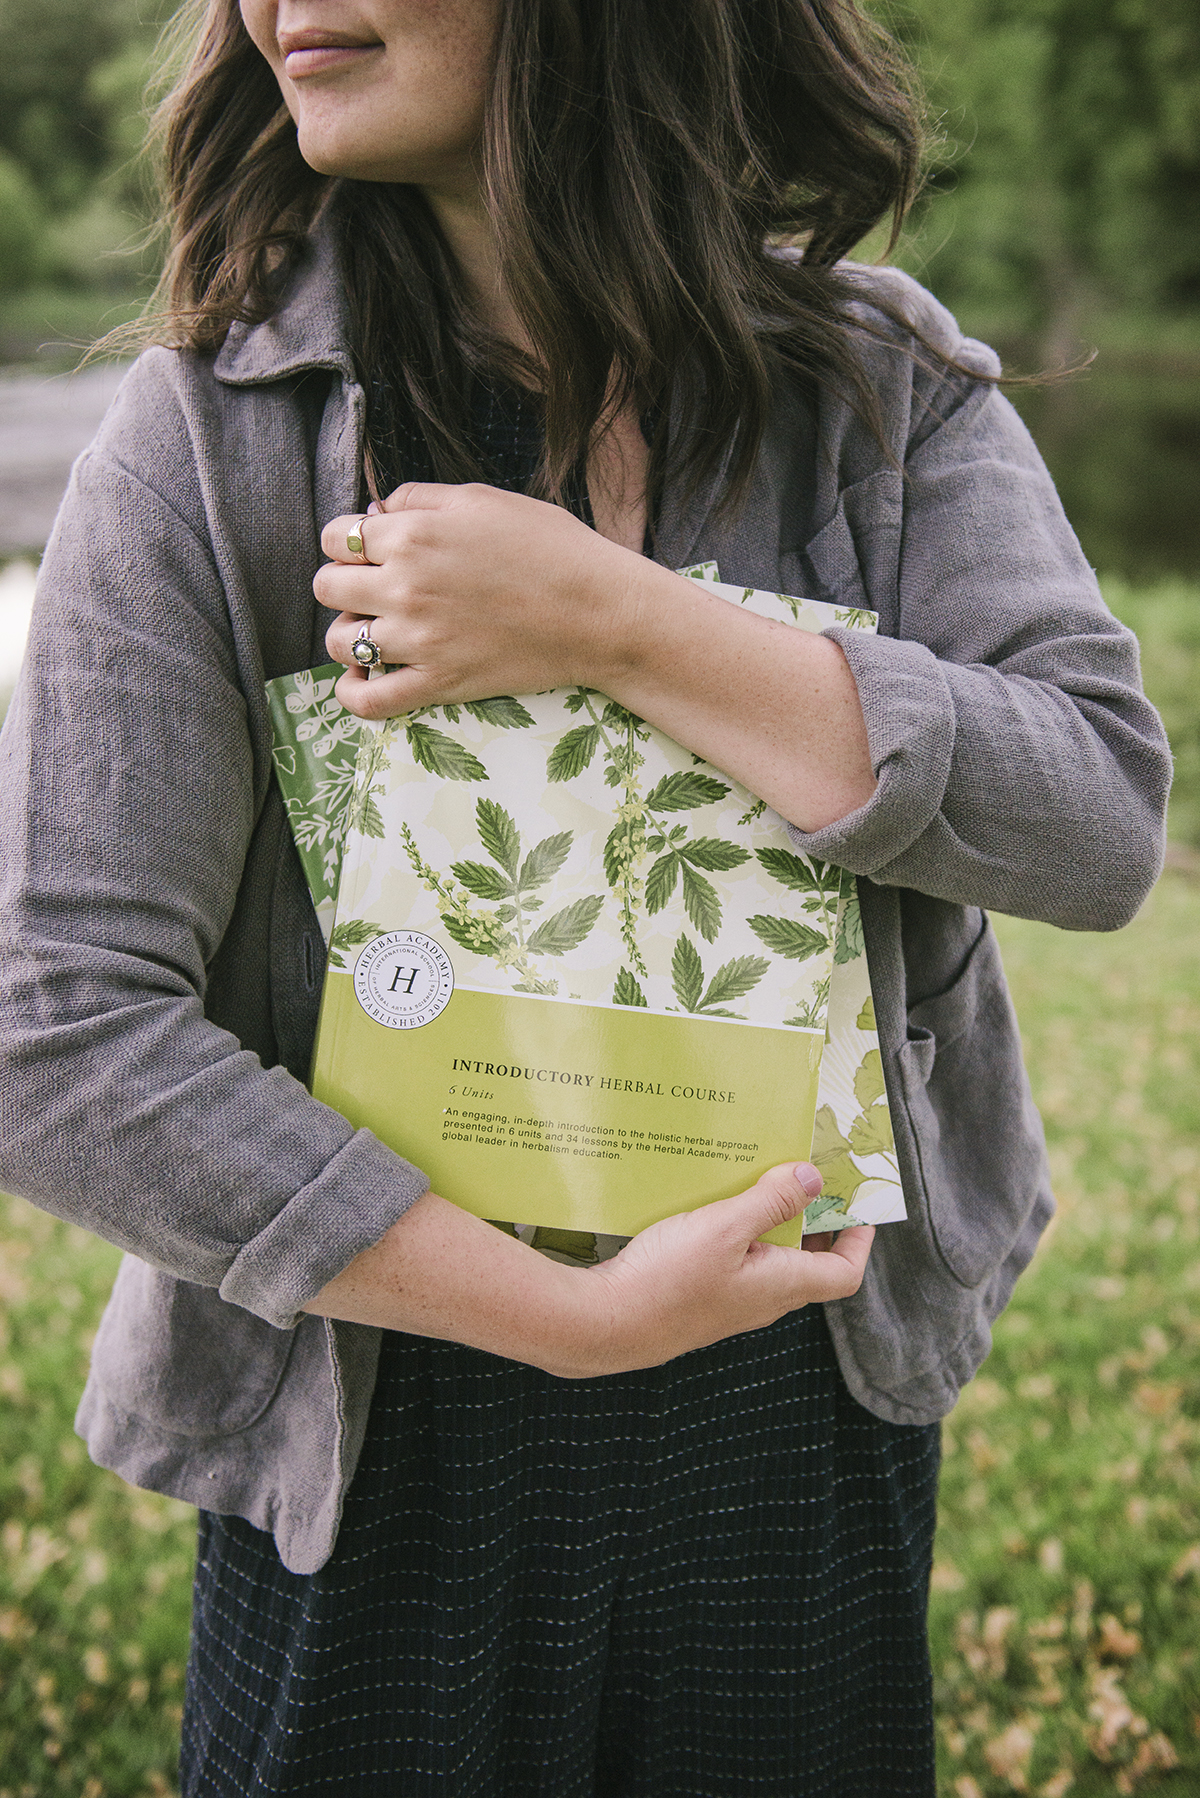 Back to school photos - Herbal Academy herbal textbooks (1).jpg